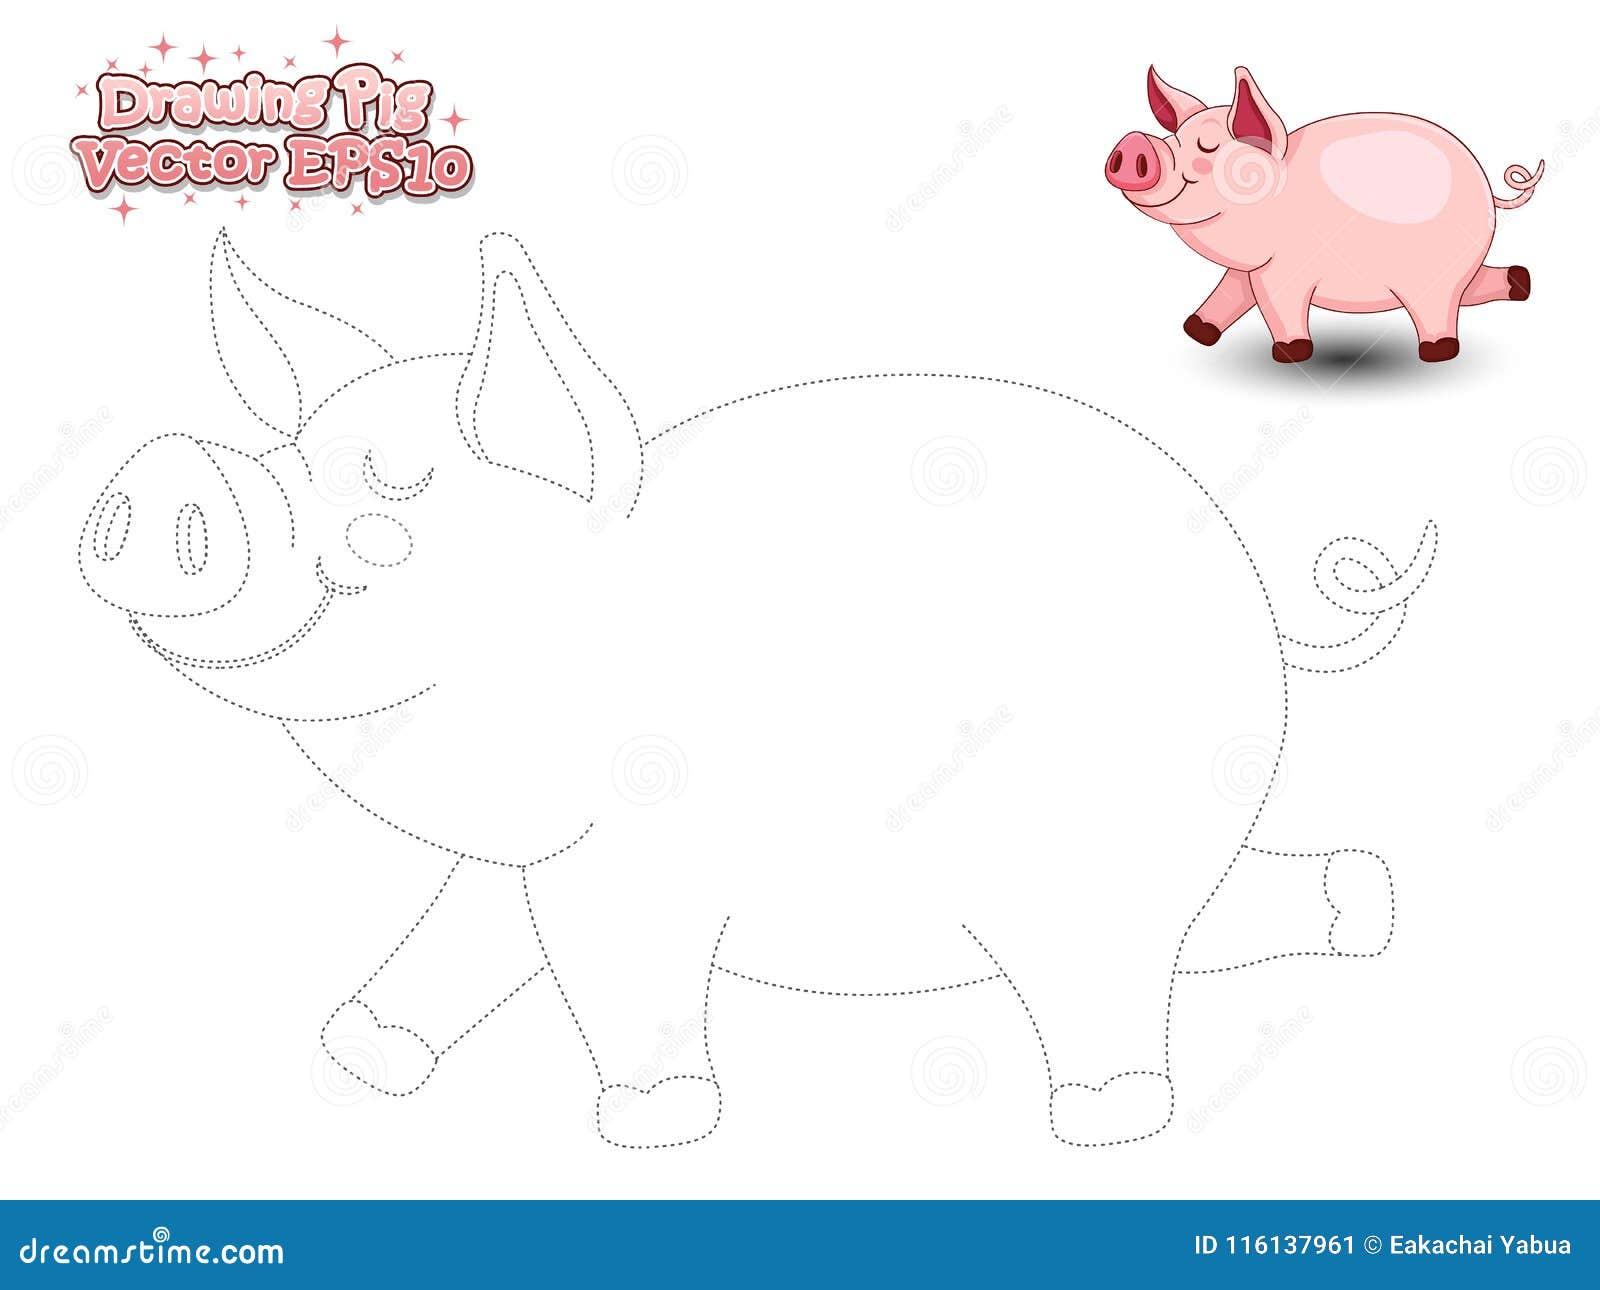 drawing cute cartoon pig color educational game kid drawing cute cartoon pig color educational game kids